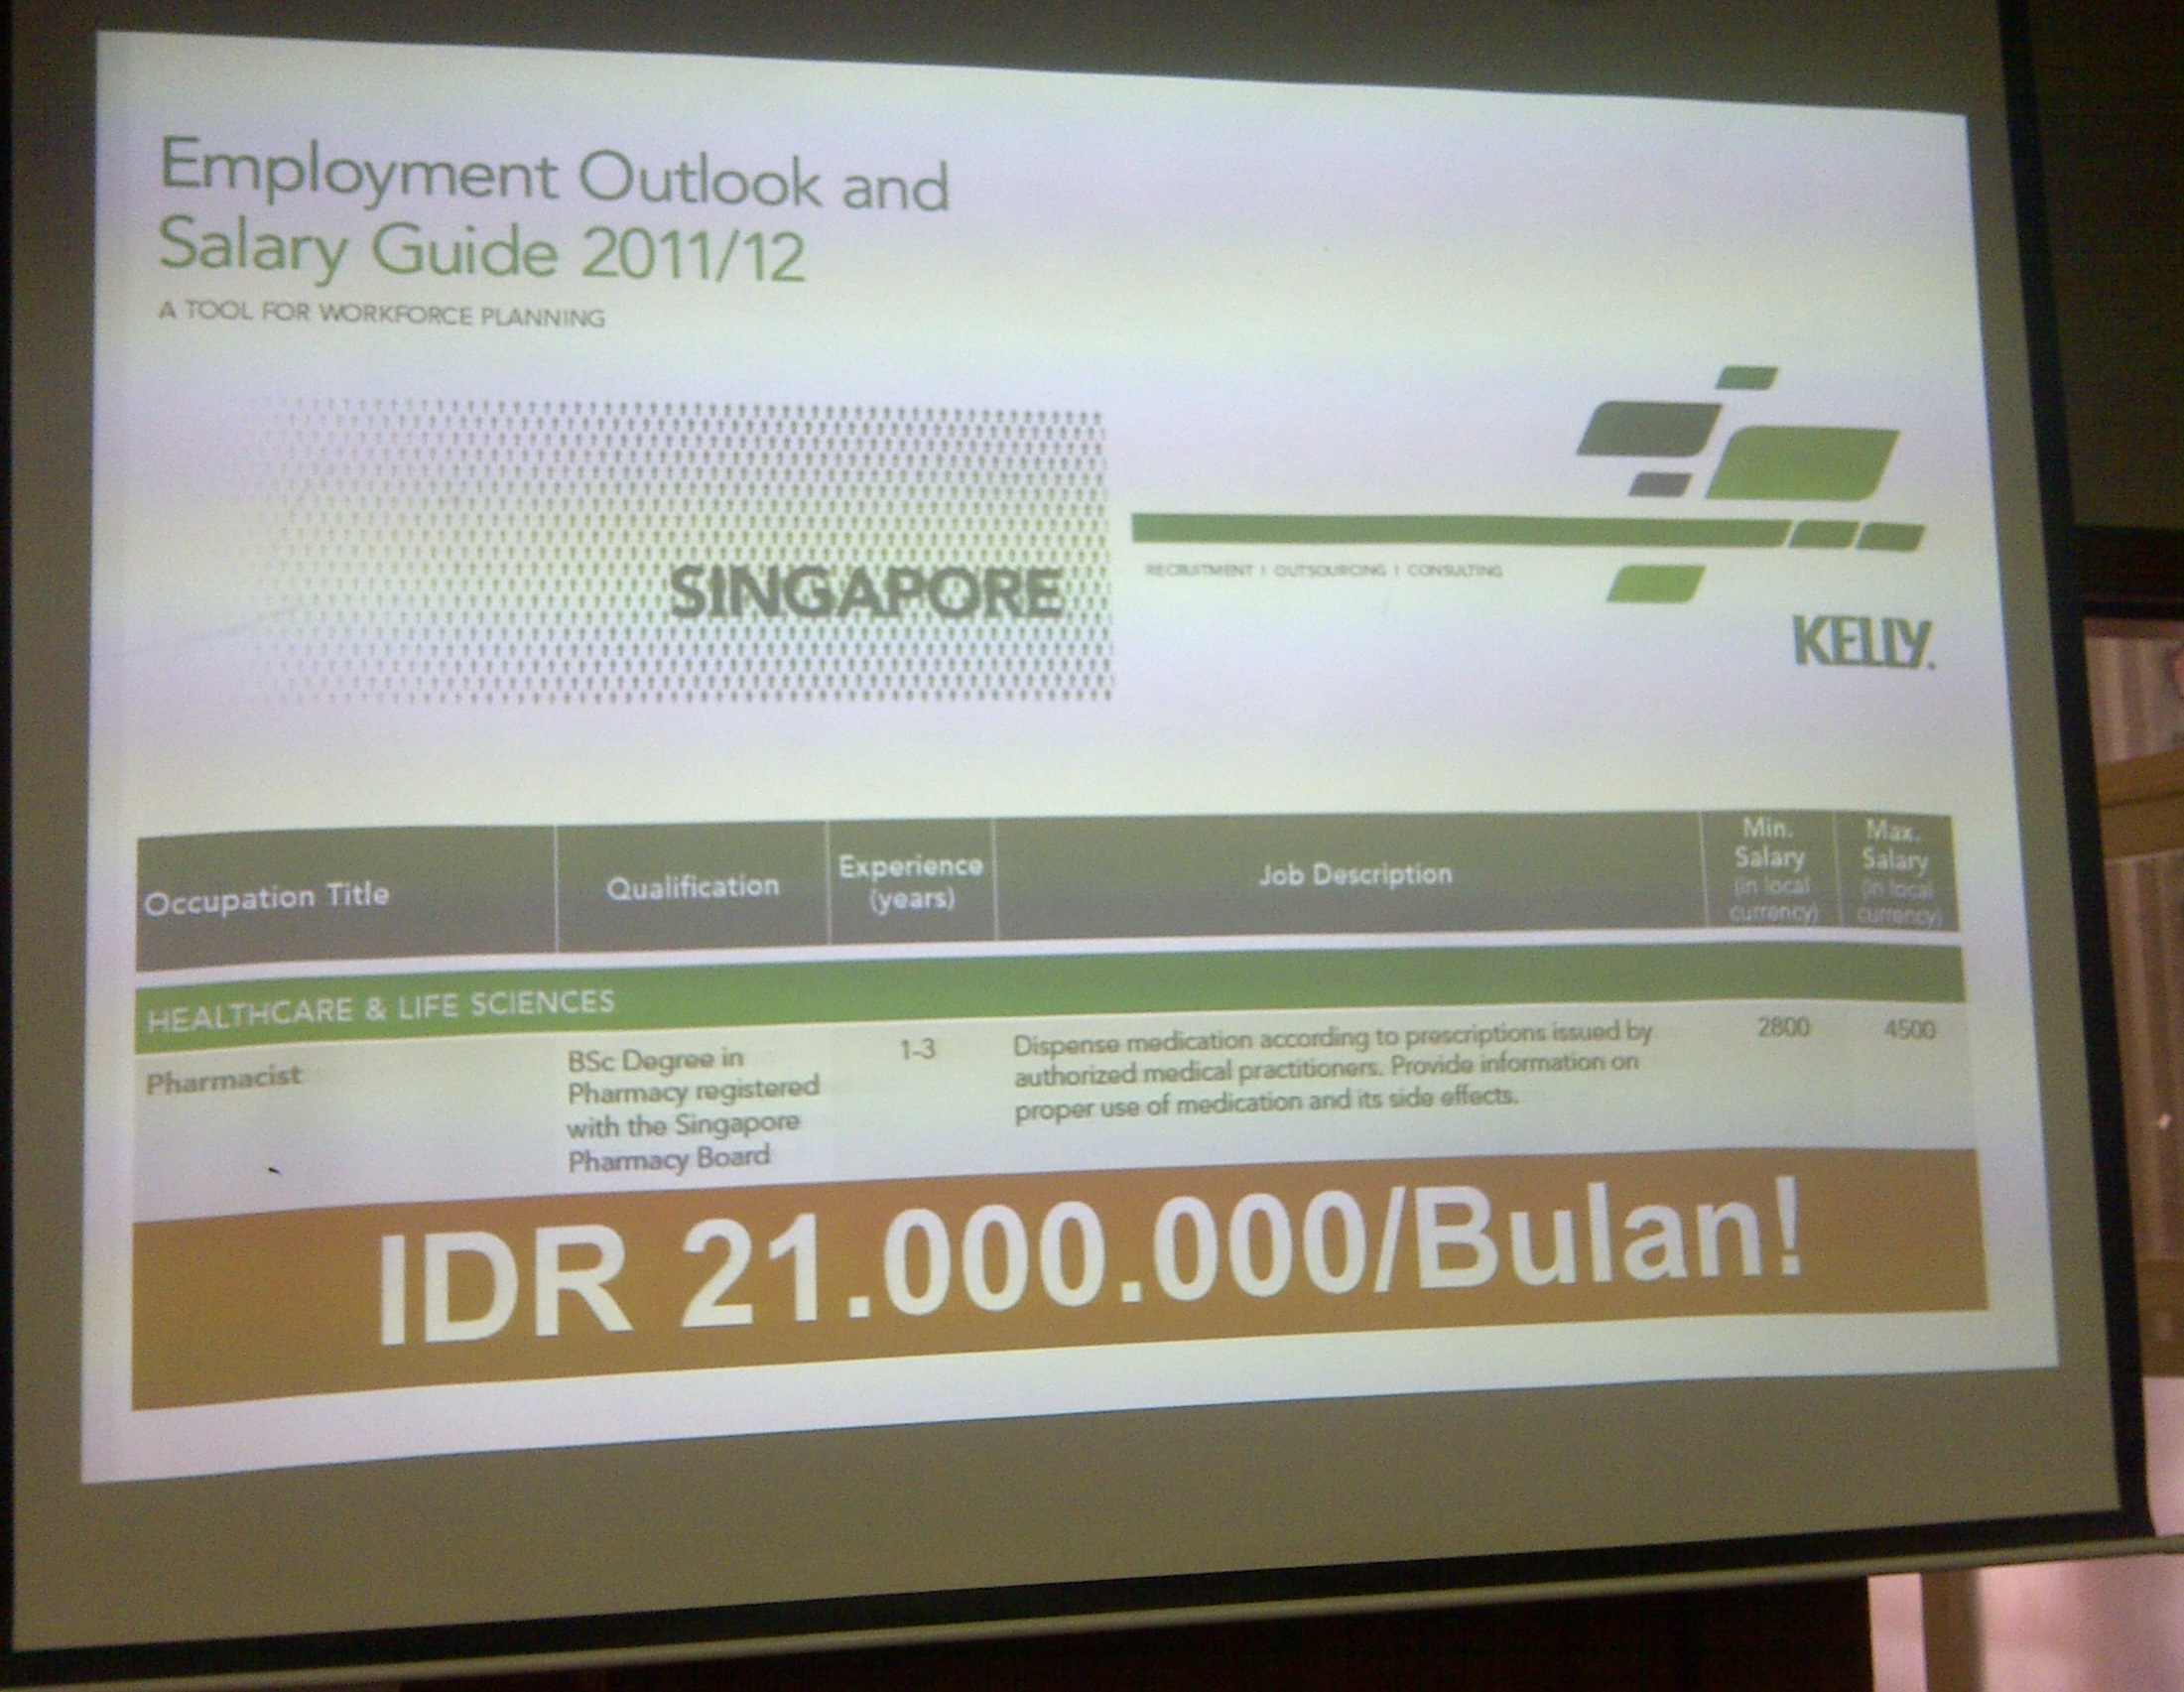 Kisaran Gaji Di Bidang Farmasi Di Singapura 2011 2012 Dan